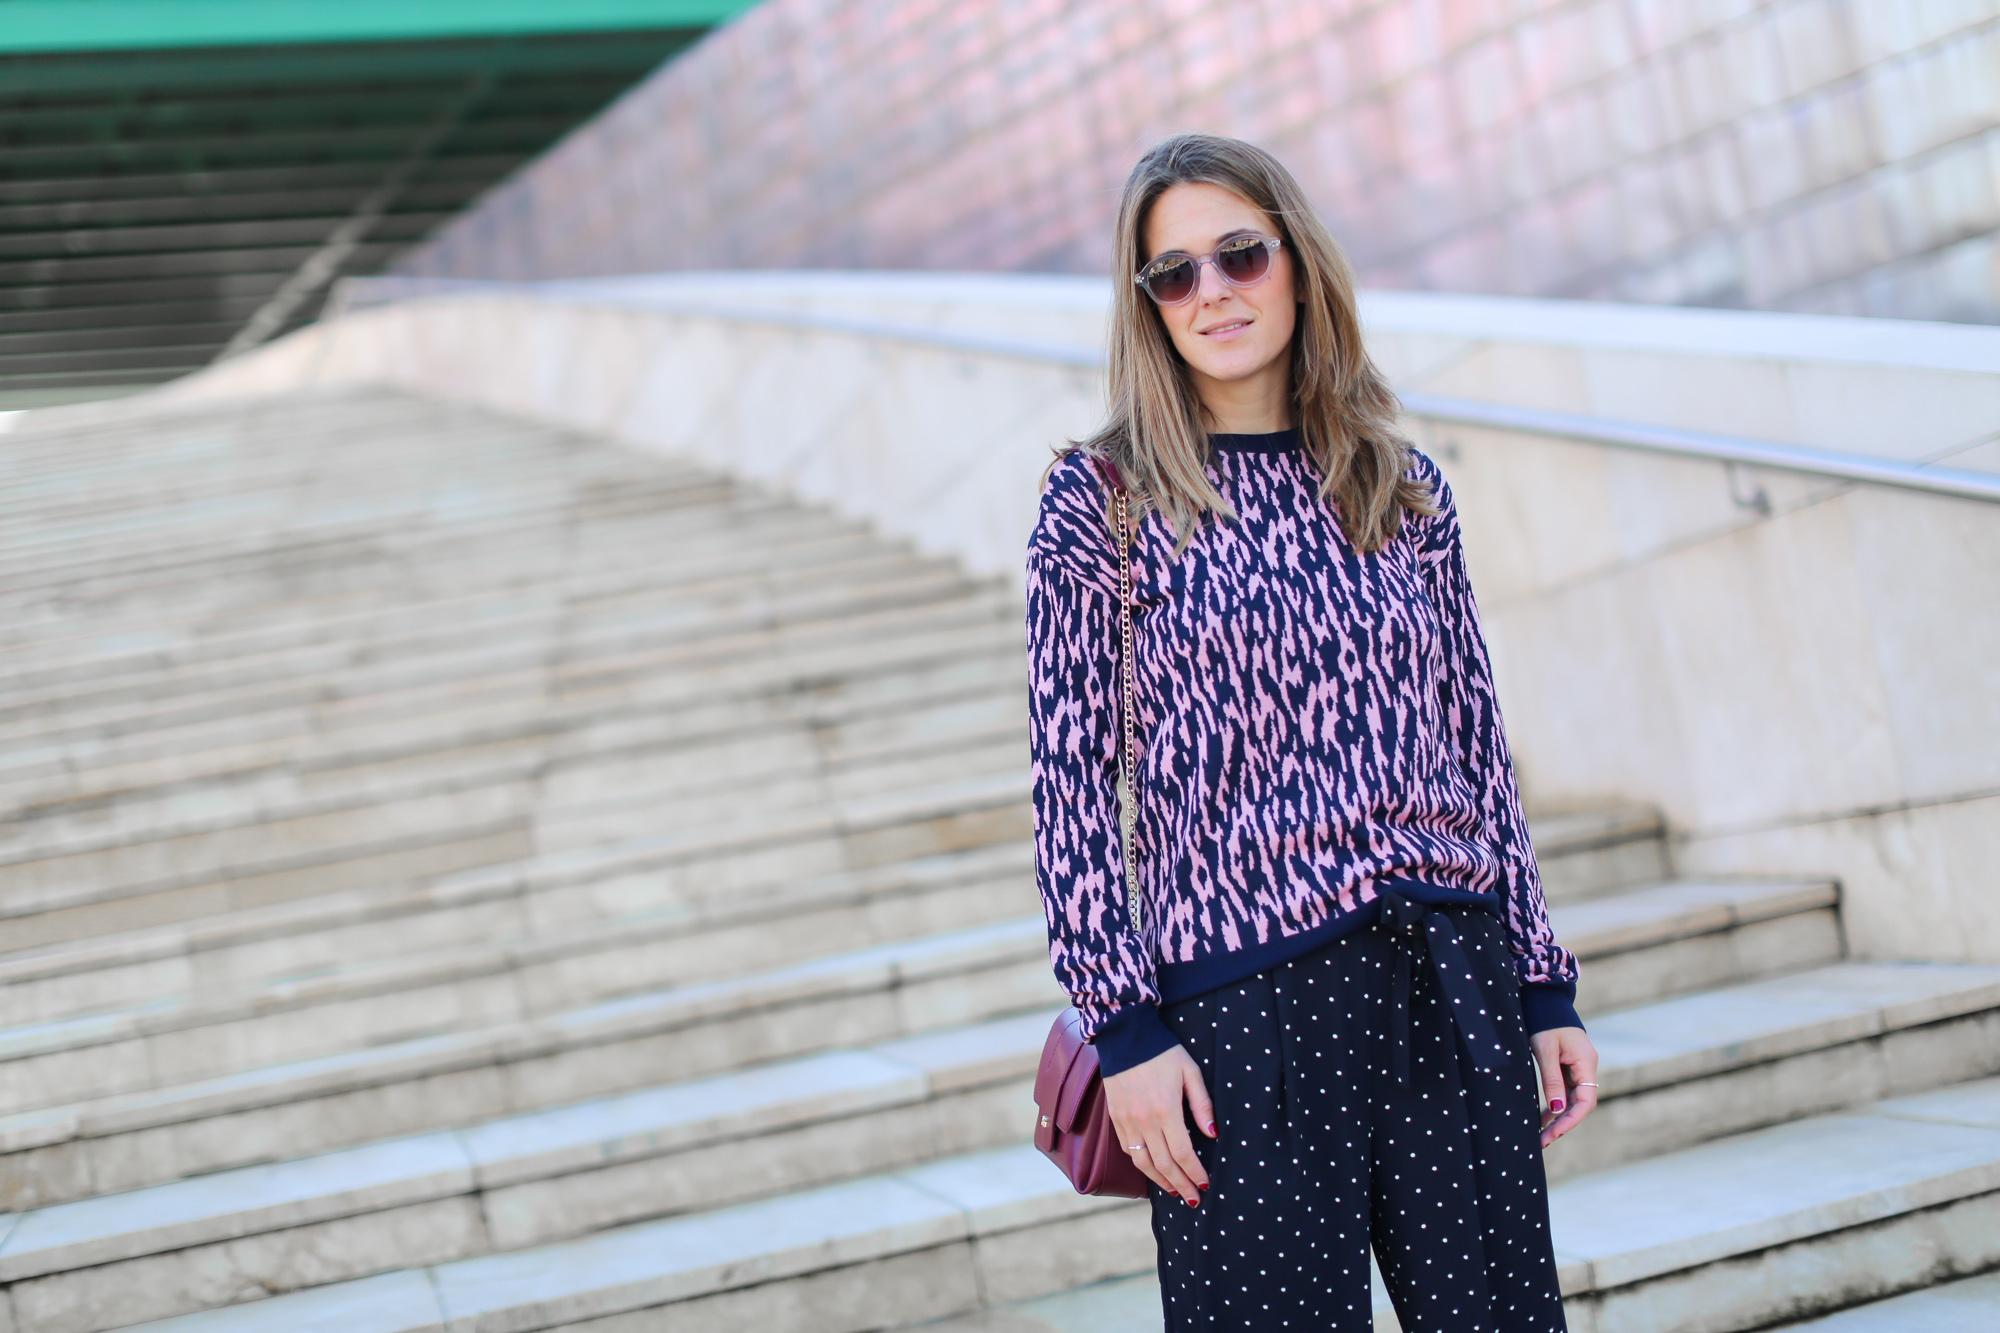 Clochet_streetstyle_fashionblogger_andotherstories_merinowooljacquardsweater_leopardprintpinkandblue_adidasstansmith-7